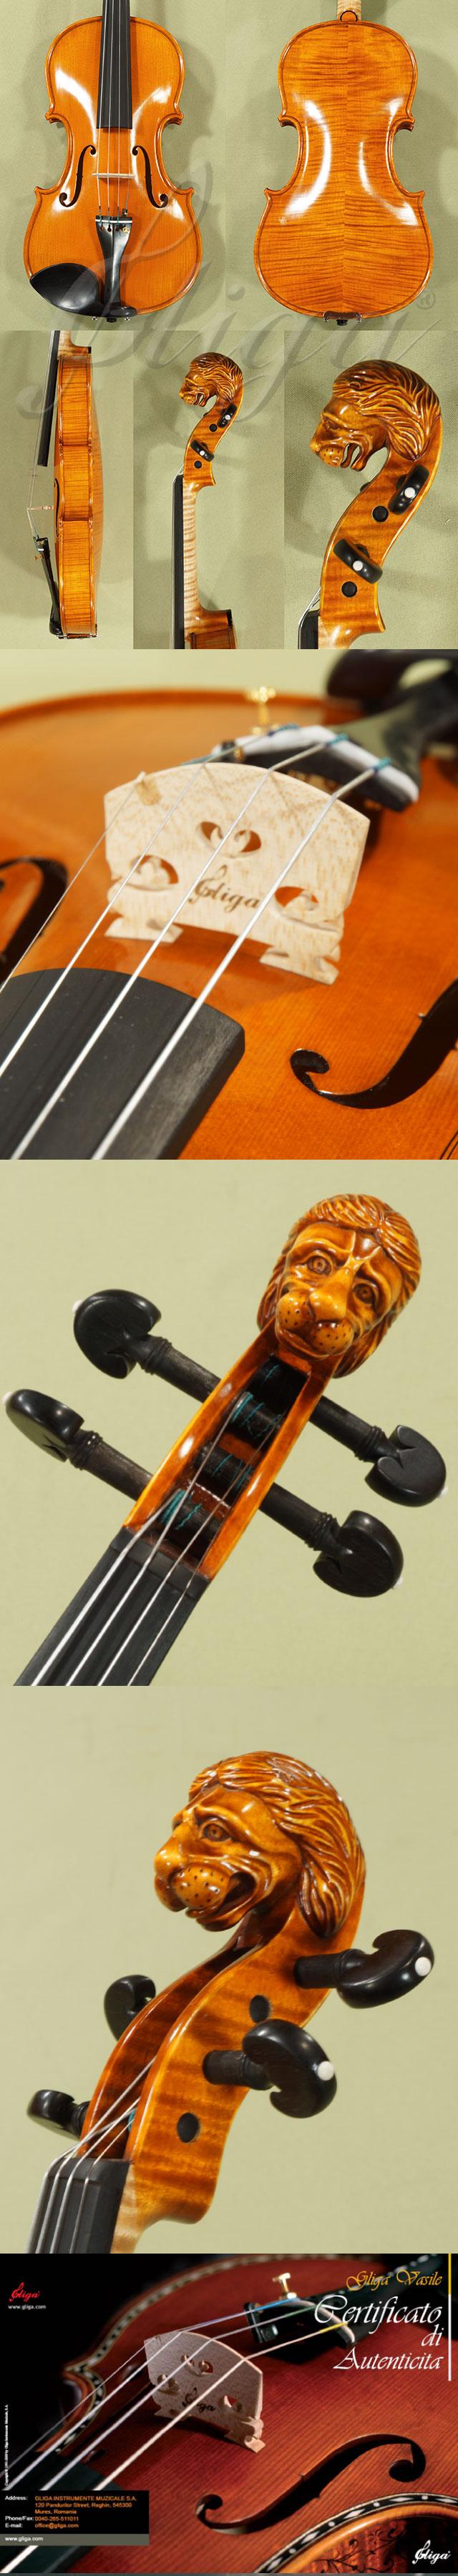 4/4 MAESTRO VASILE GLIGA 'Lion' Scroll Violin